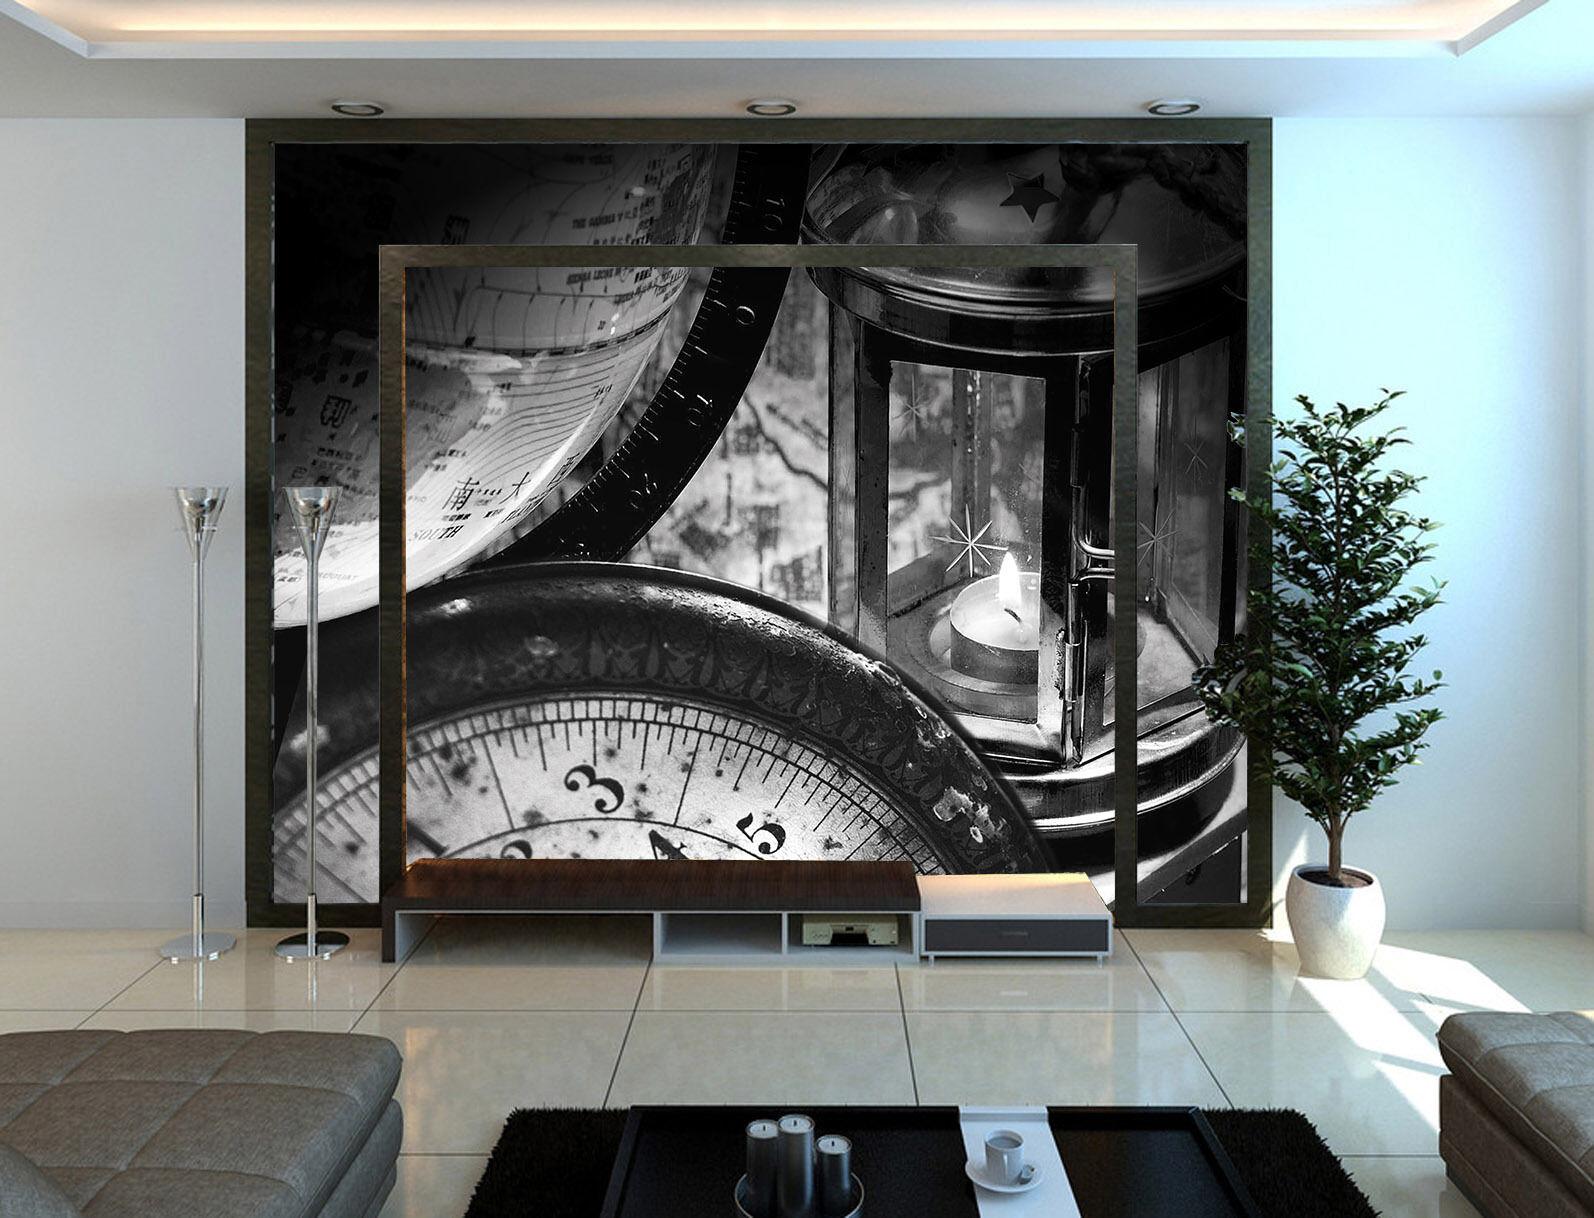 3D Uhren, globen 07676 Fototapeten Wandbild Fototapete BildTapete Familie